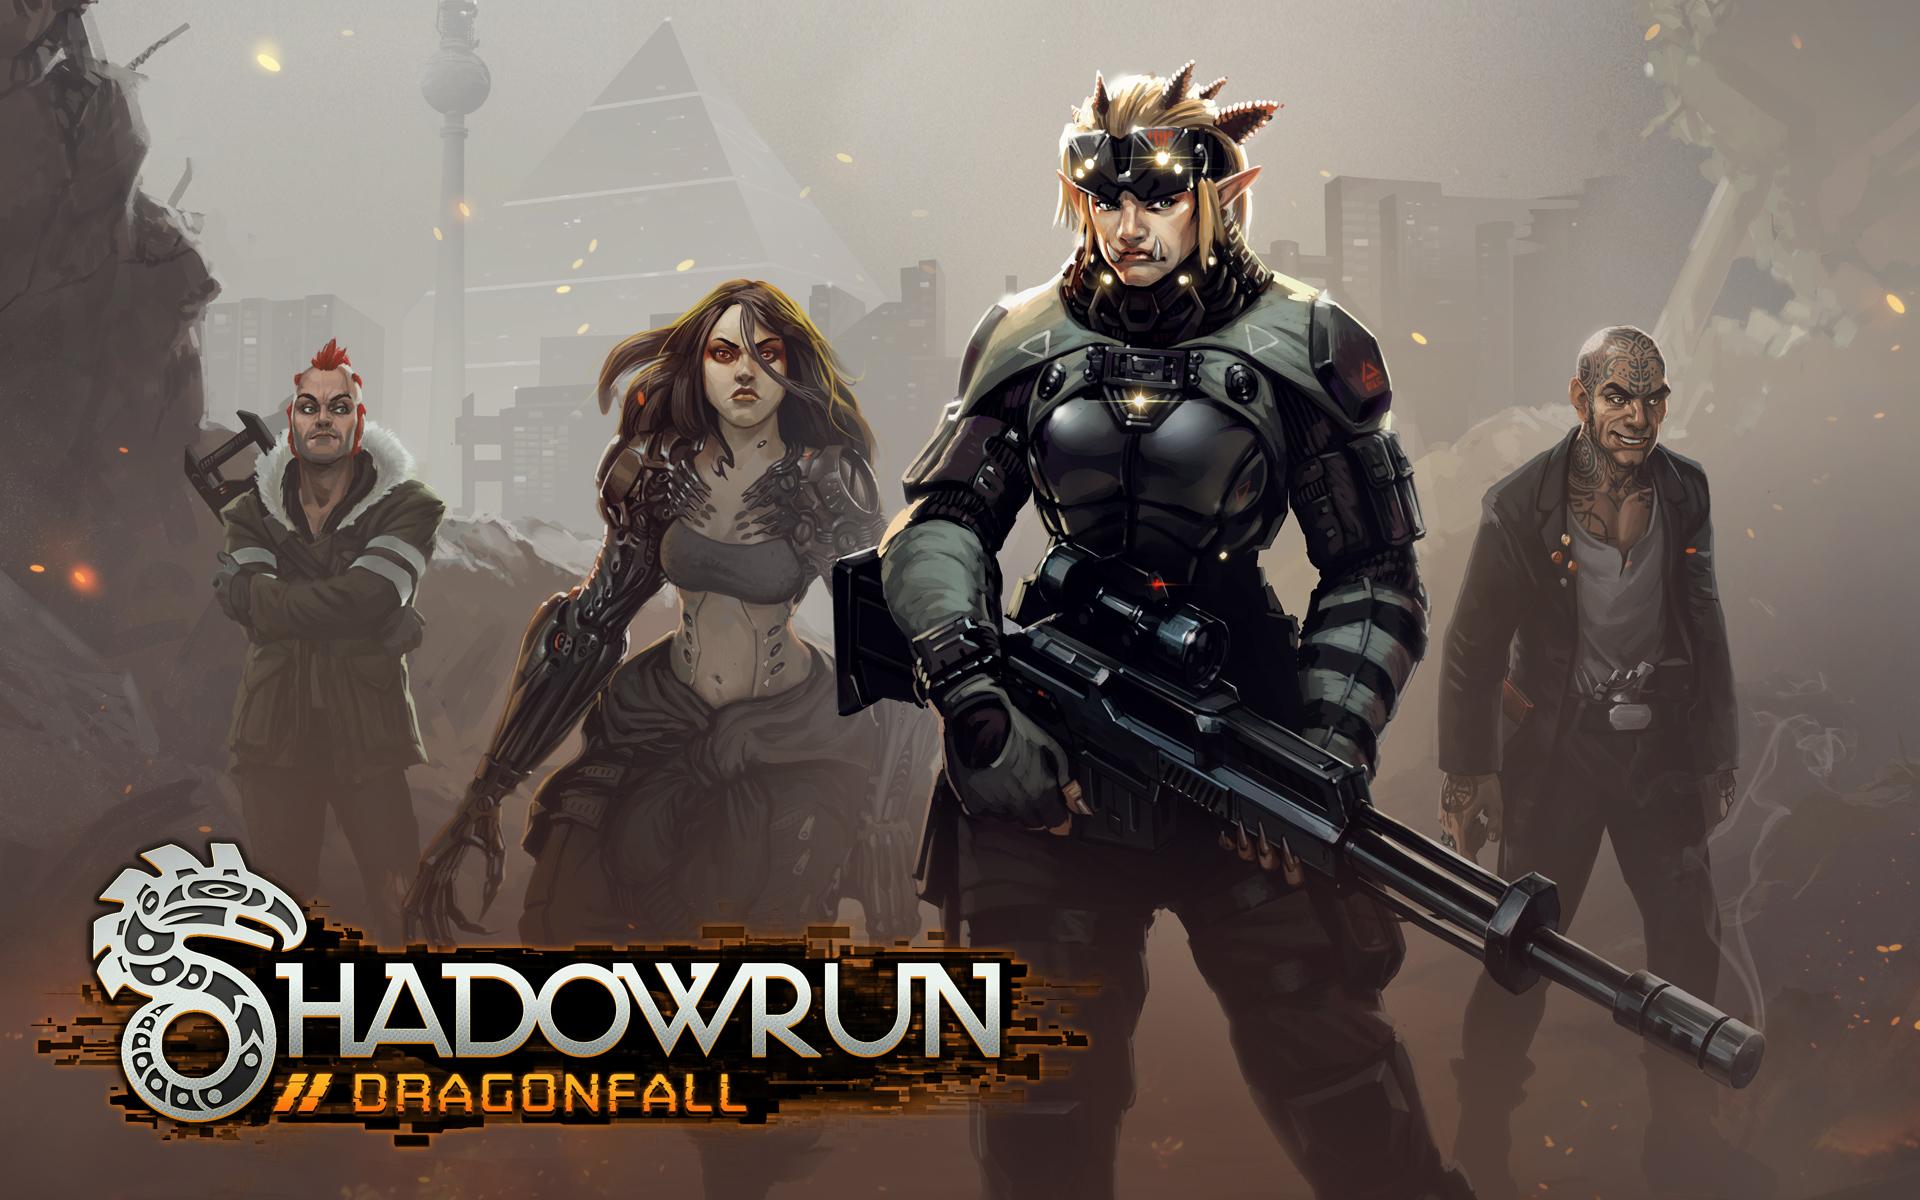 http://www.harebrained-schemes.com.s3.amazonaws.com/wp-content/uploads/2013/11/dragonfallWall1920x1200.jpg